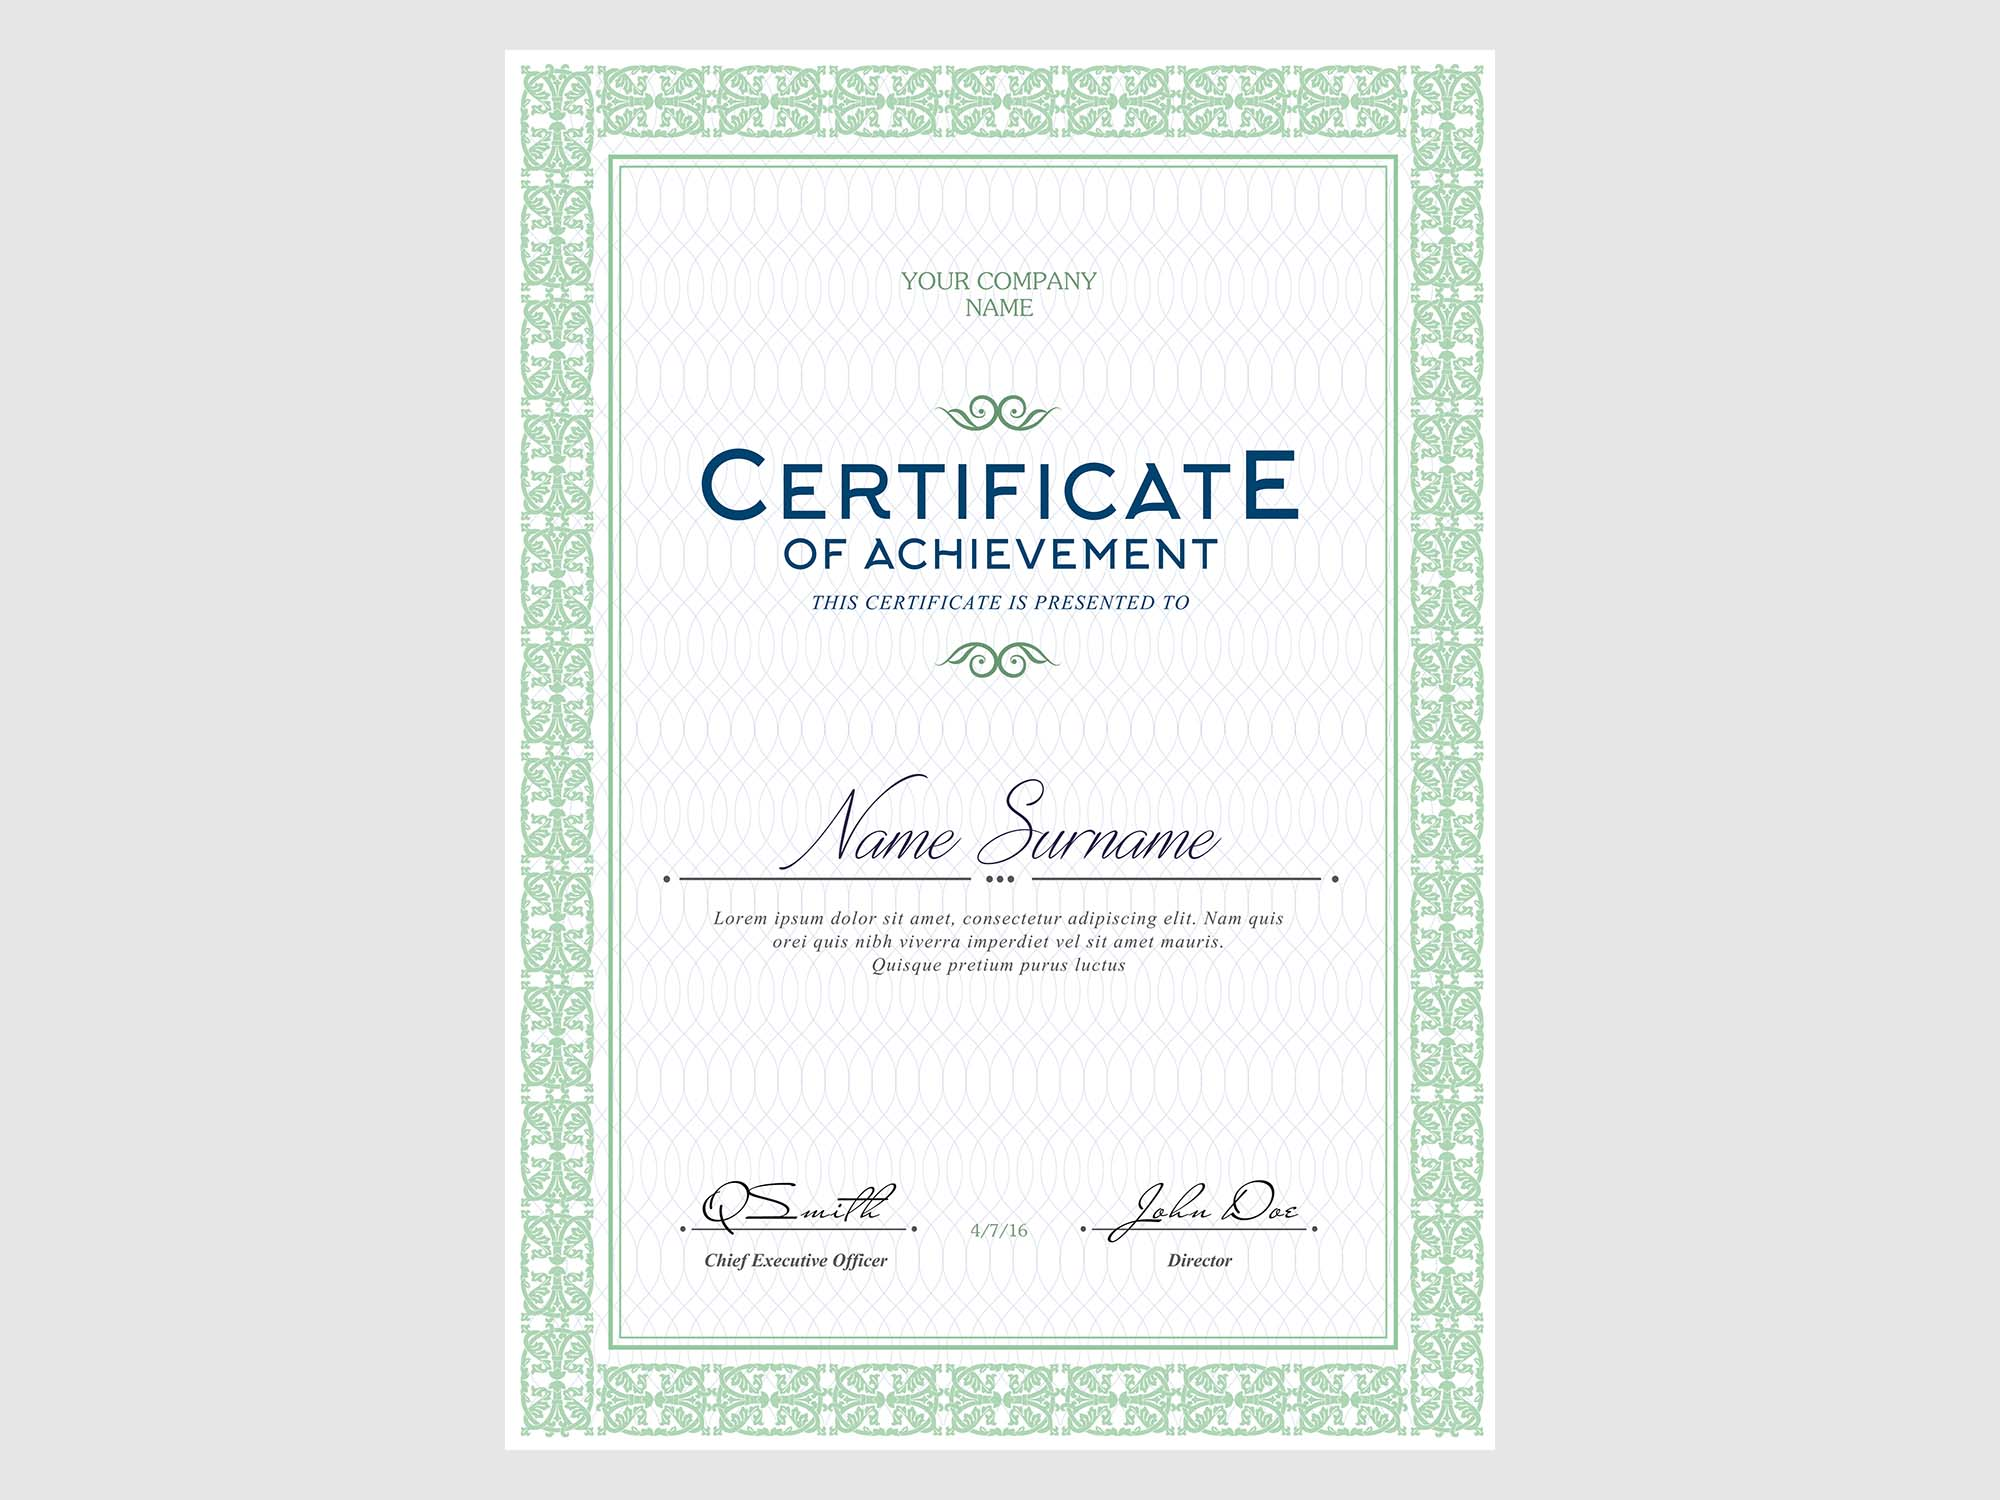 Free Certificates Templates (PSD)